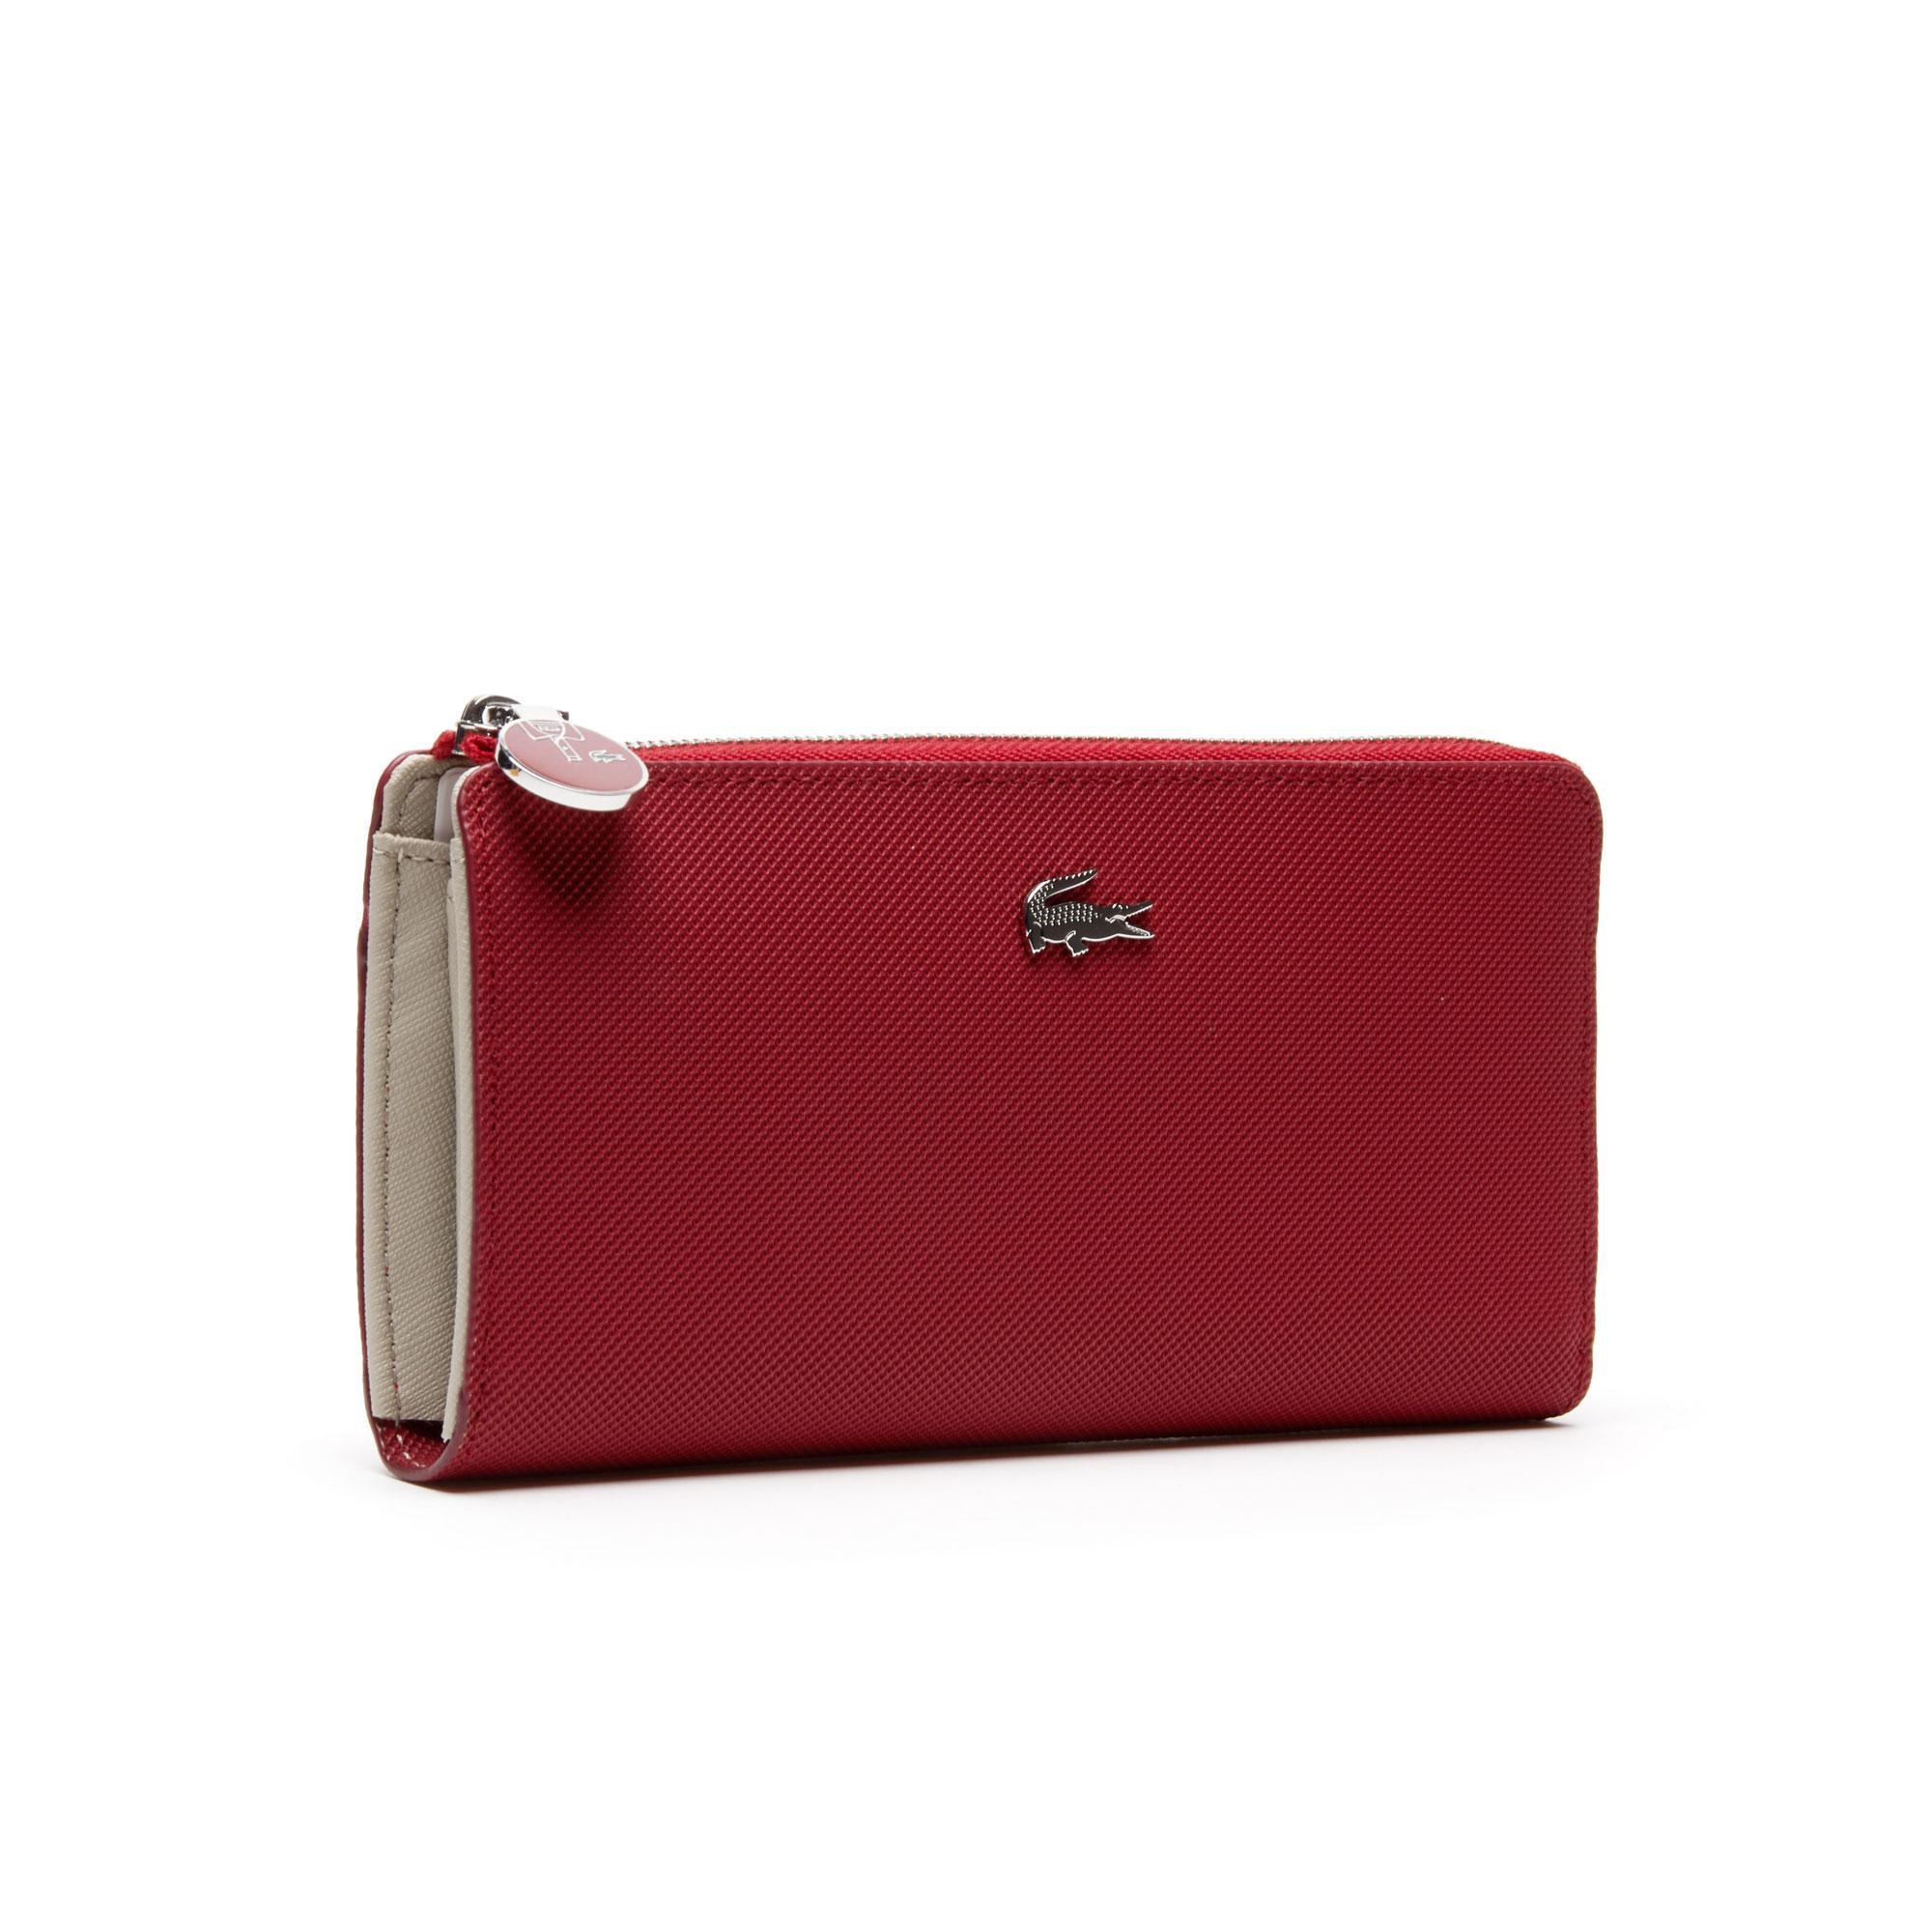 Lacoste гаманець жіночий Daily Classic